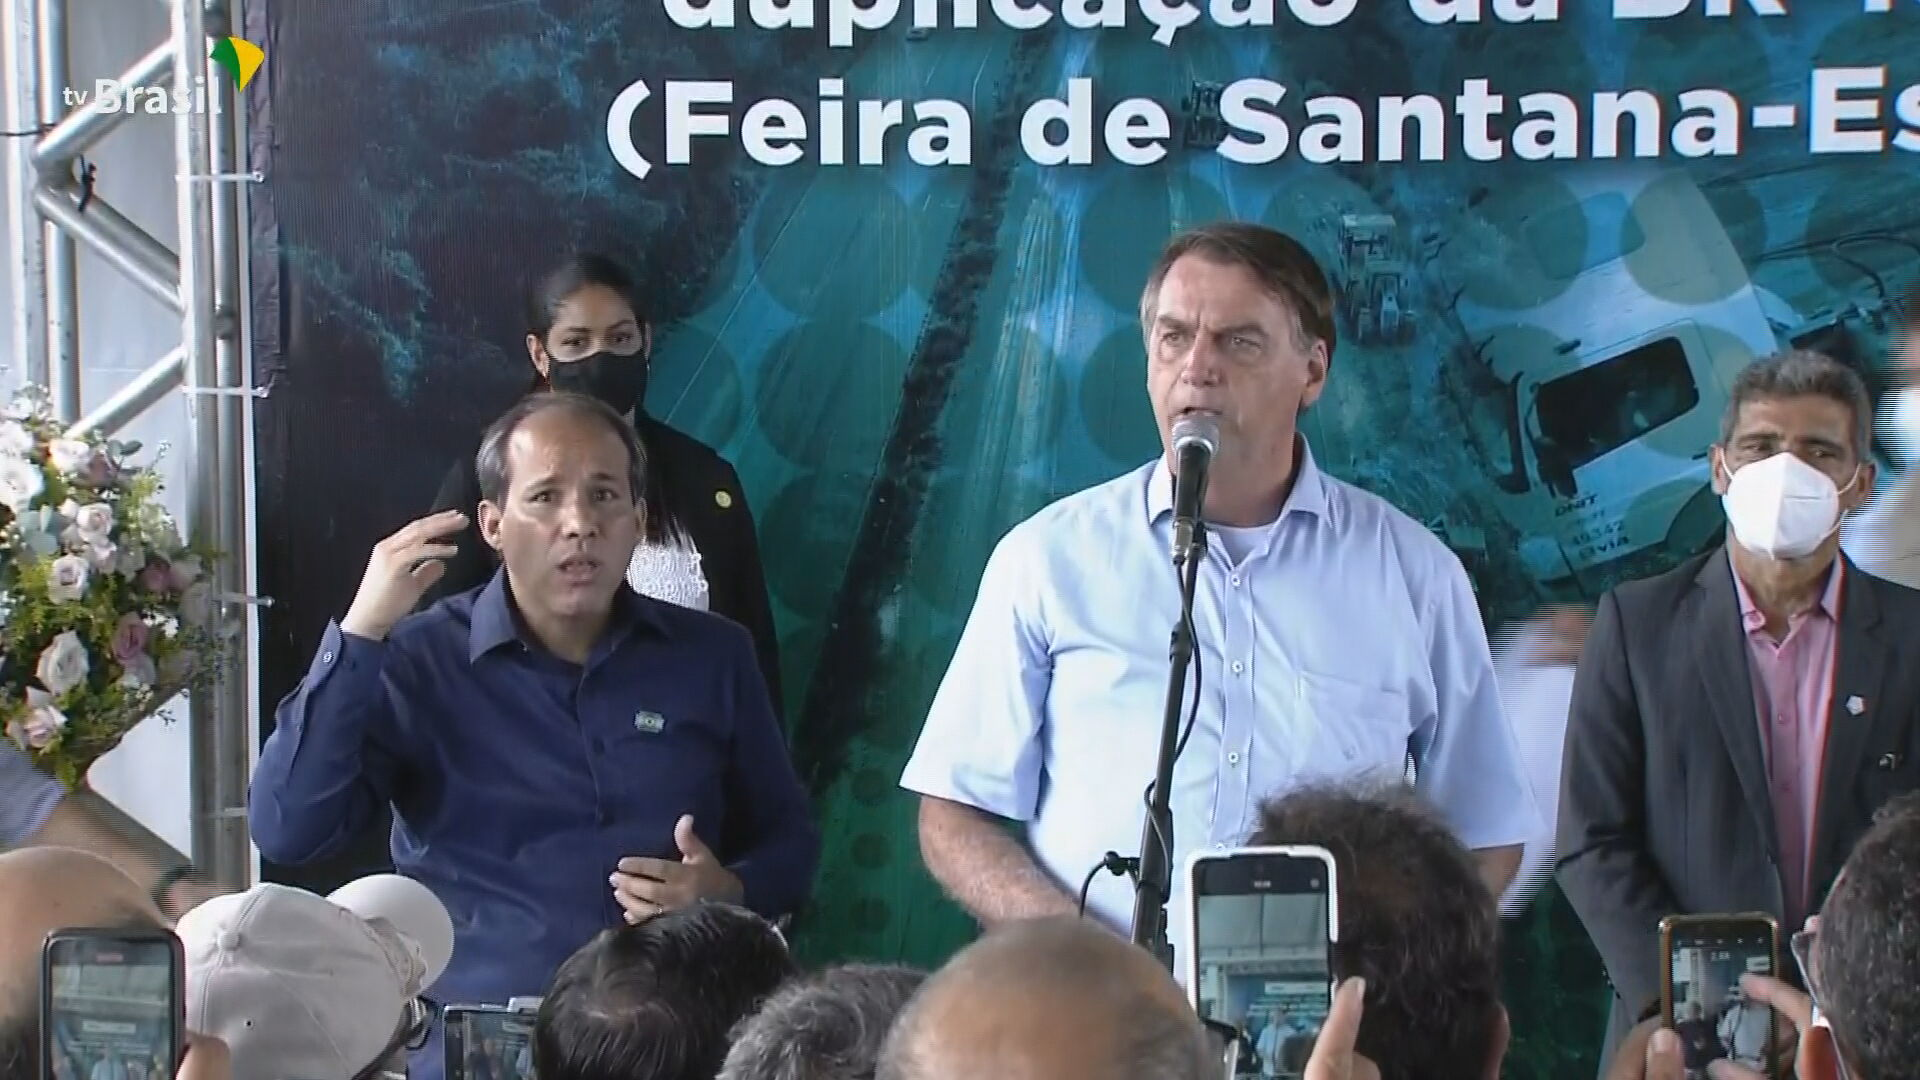 O presidente Jair Bolsonaro discursou durante evento na Bahia